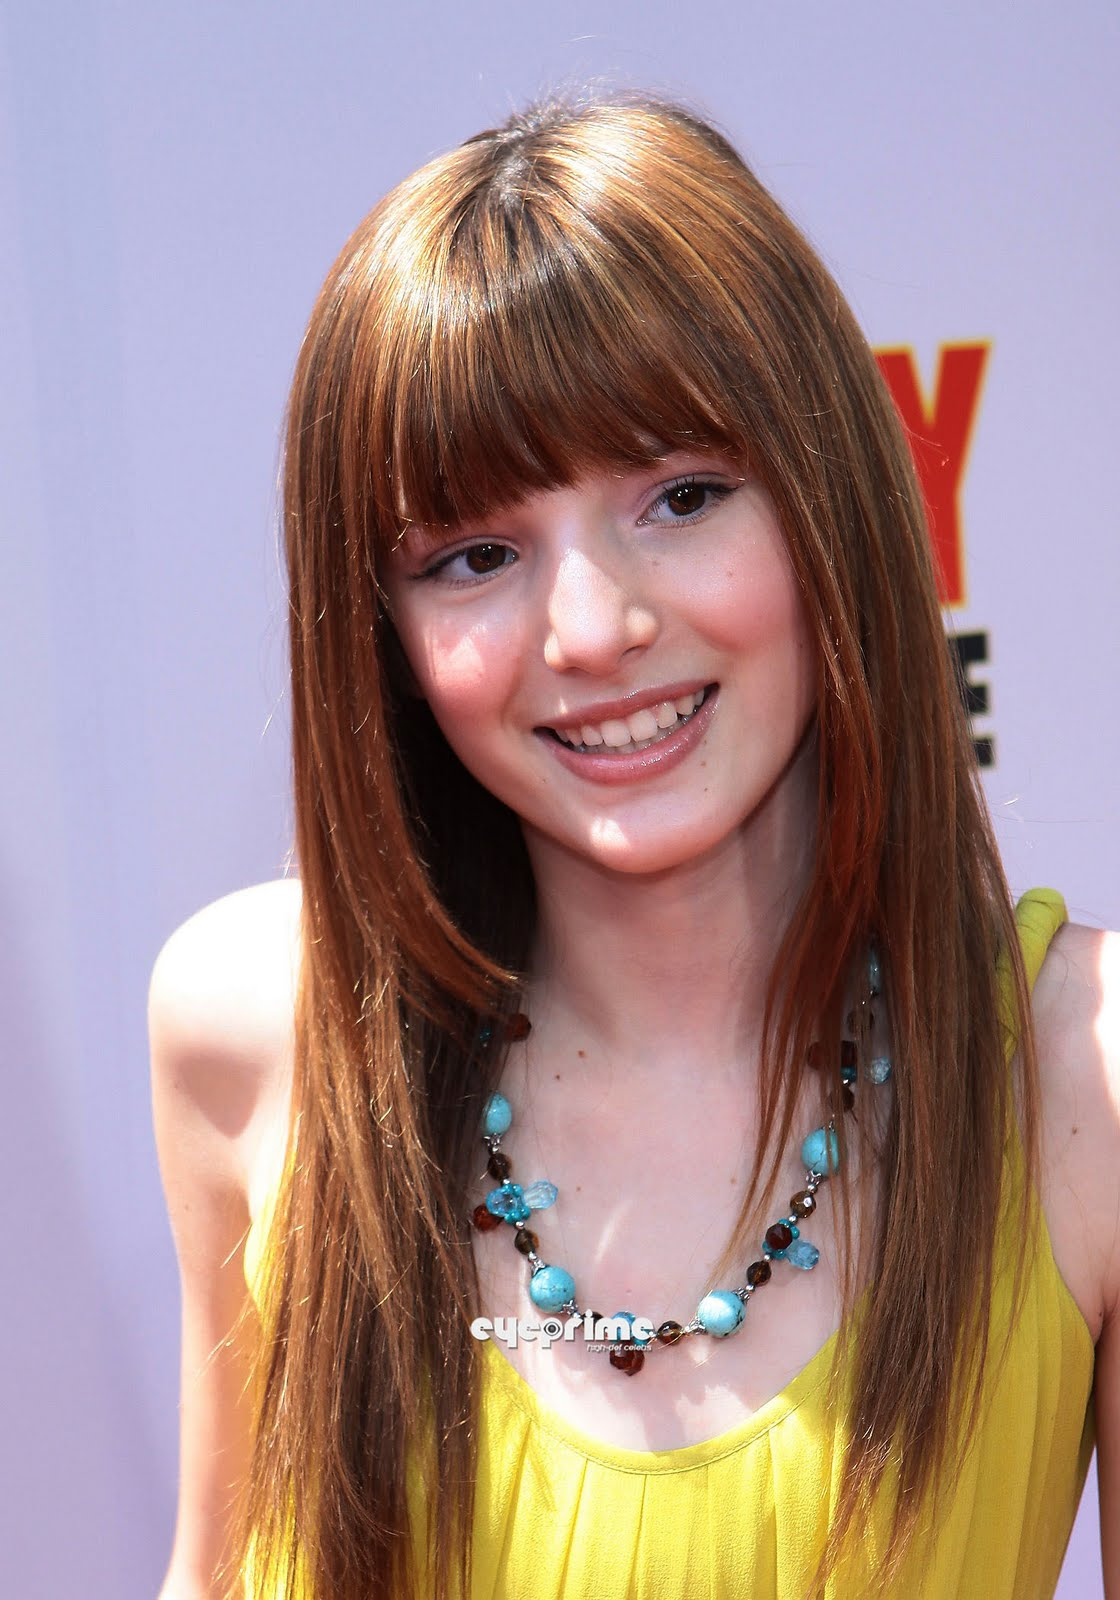 http://3.bp.blogspot.com/-DL5Lgvn7dJ0/TfYvJs5smXI/AAAAAAAAEmc/d25uYQcM9gE/s1600/Bella+Thorne+trivia.jpg